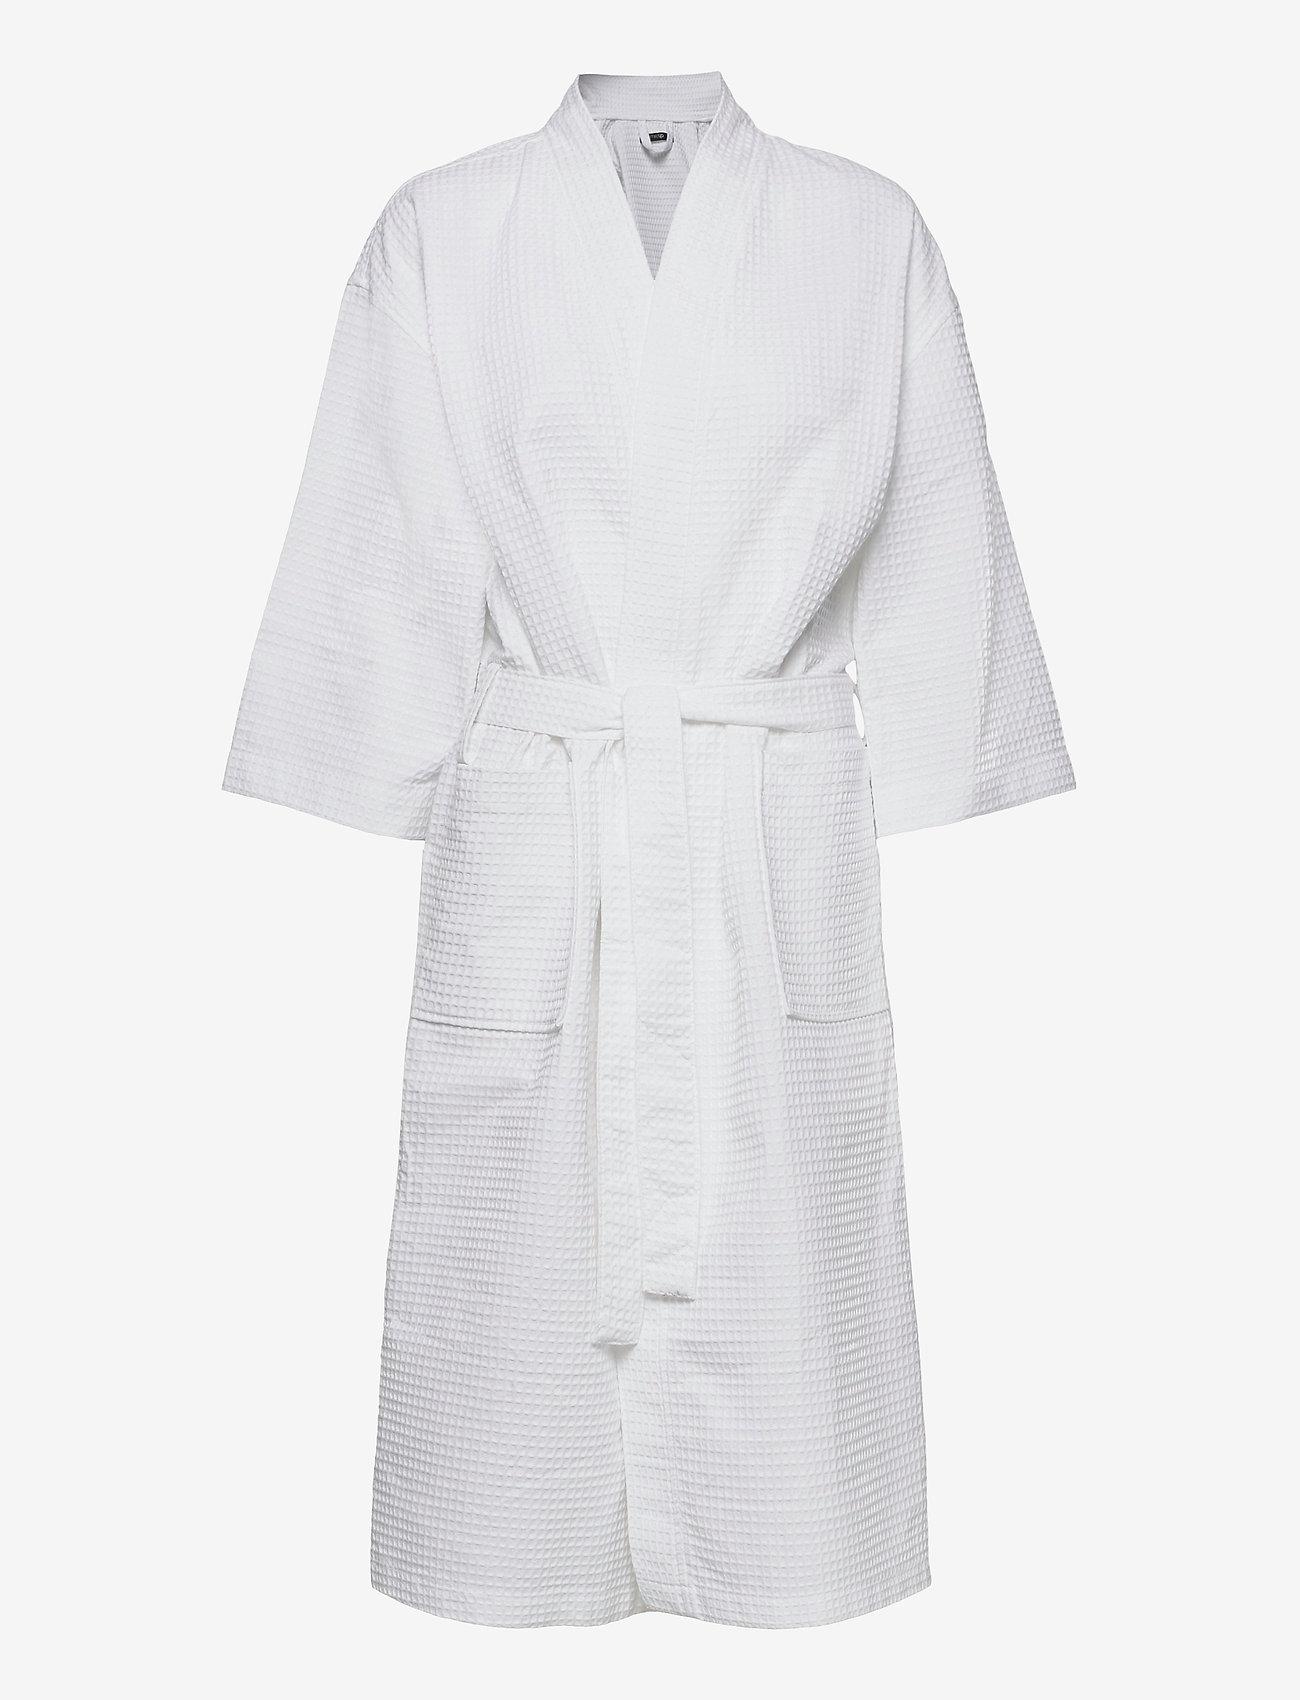 Missya - Honeycomb robe cotton - pegnoirs - white - 0